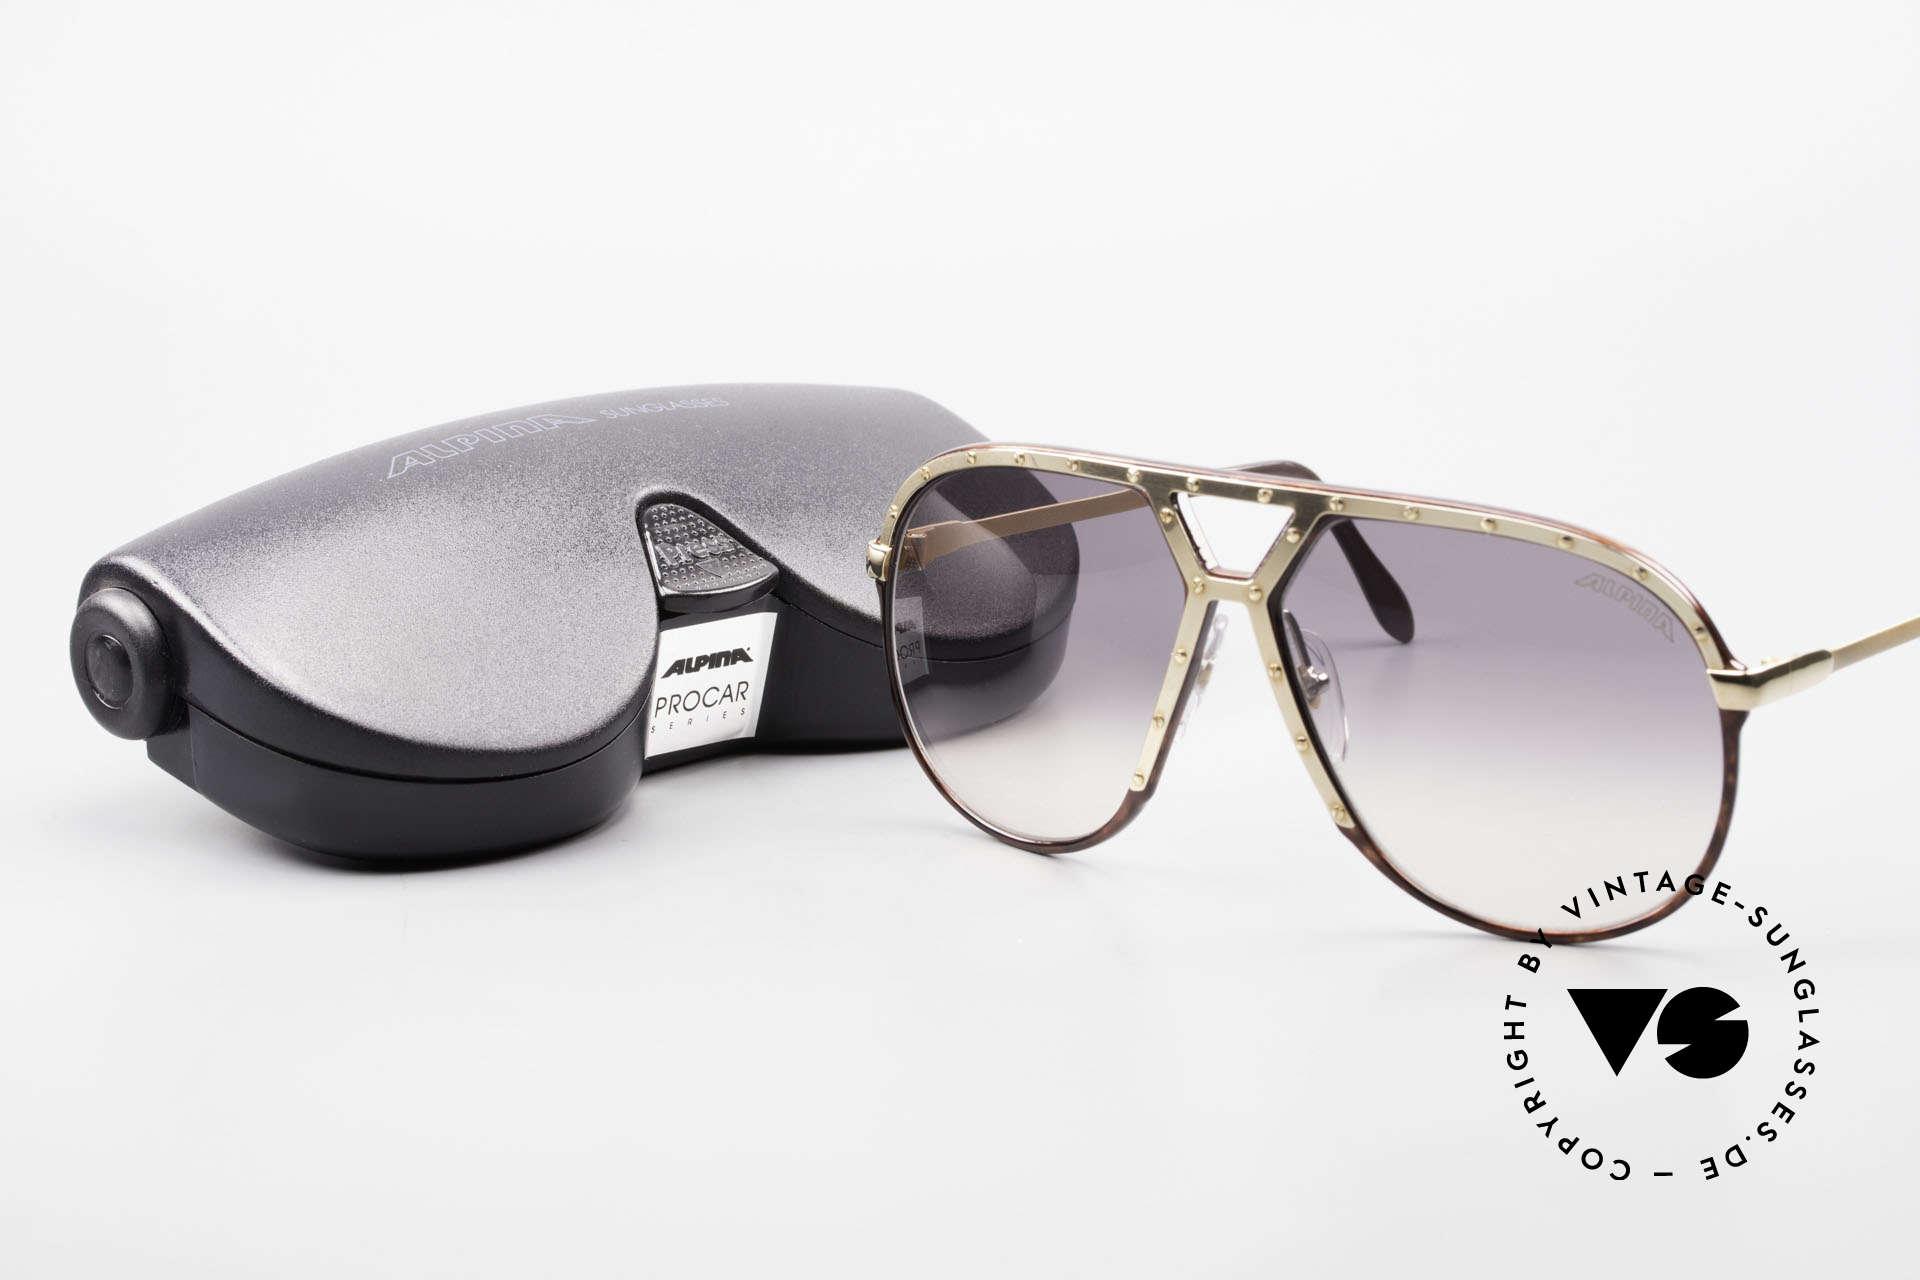 Alpina M1 Ultra Rare Aviator Sunglasses, Size: large, Made for Men